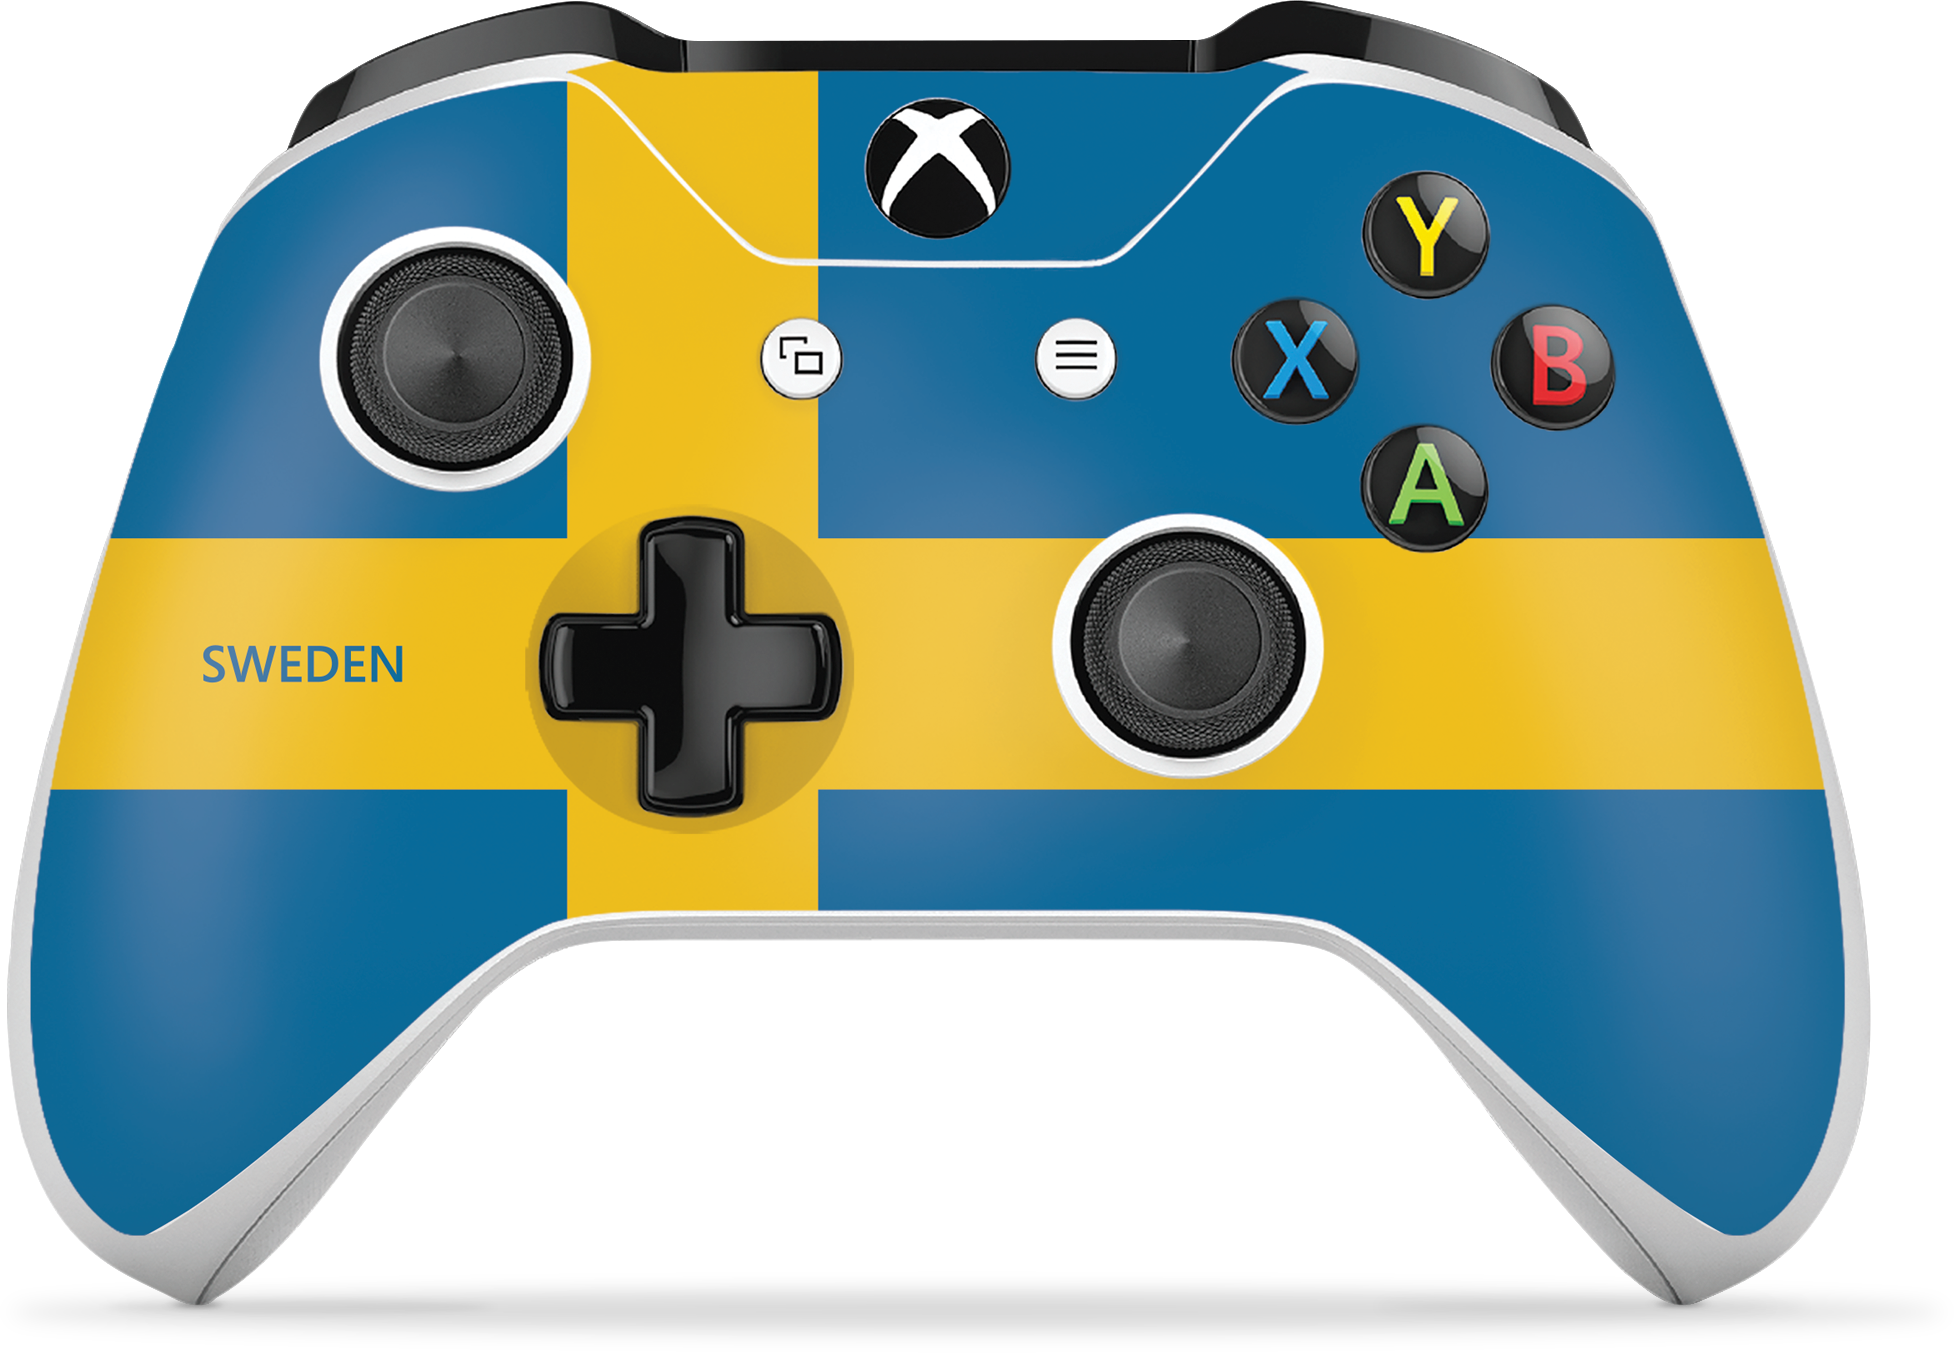 RE1ZazI?ver=33ba - Controller Gear World's Game Controller Skins (Sweden)